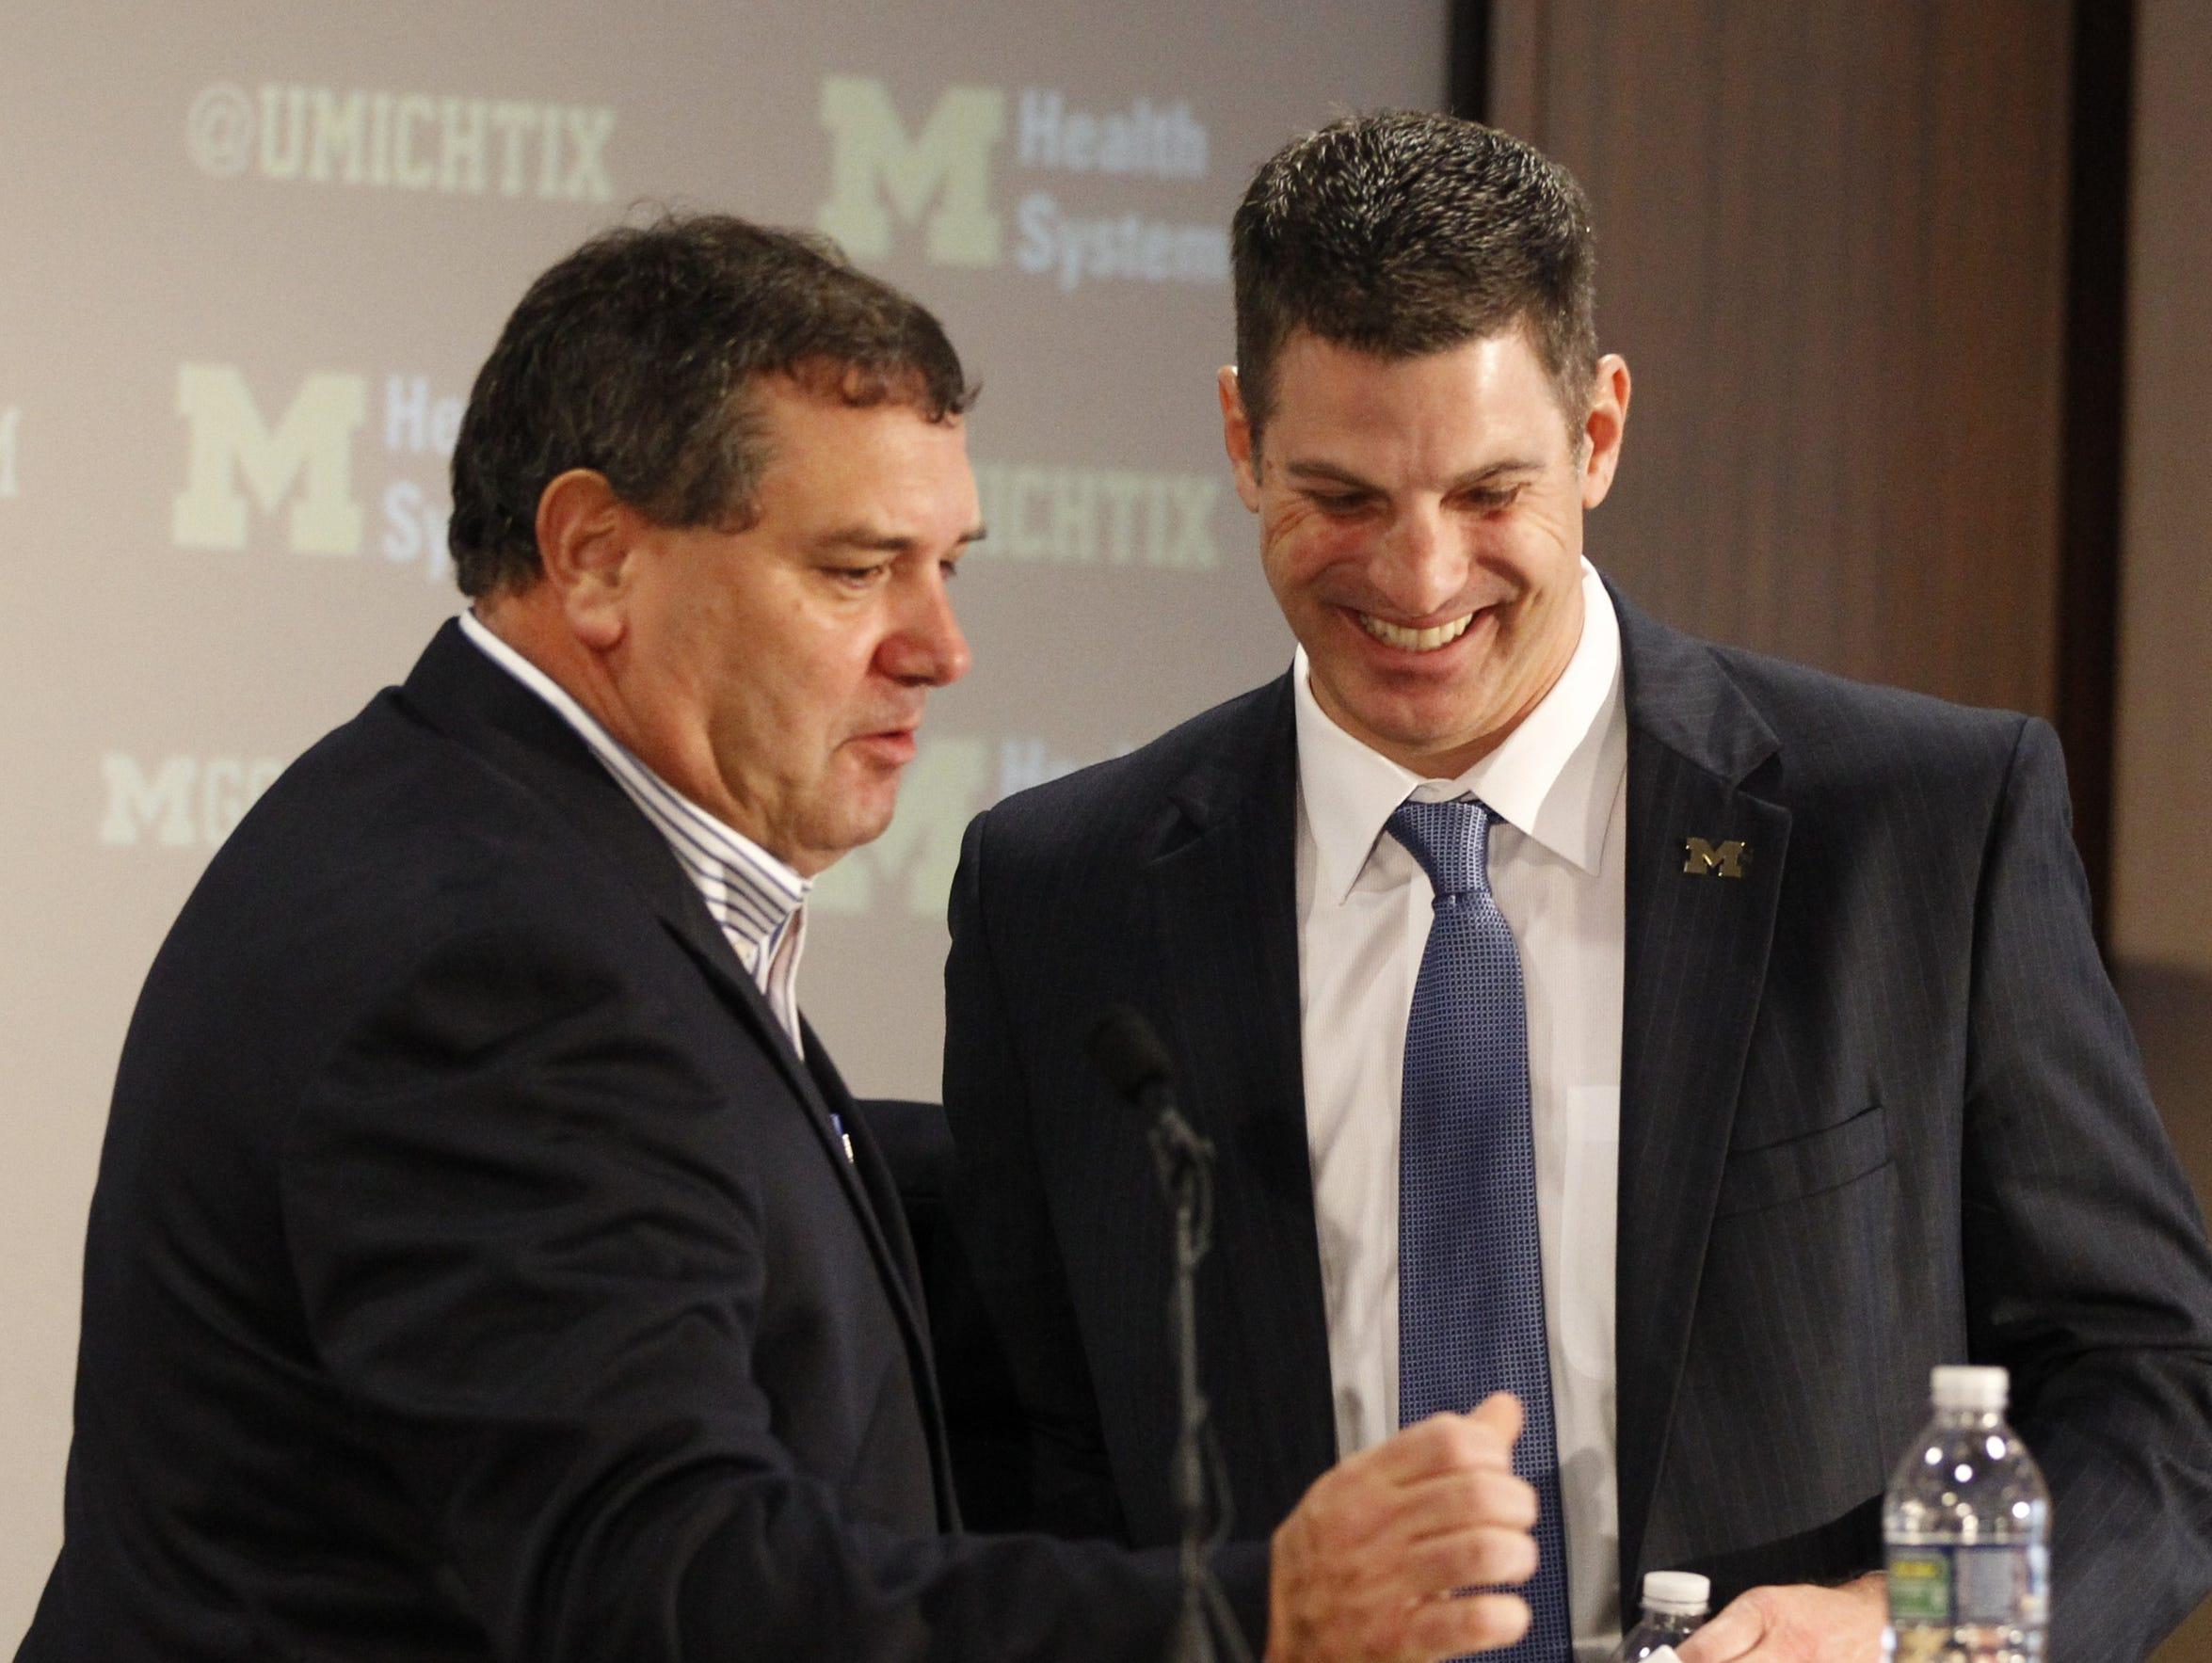 Brady Hoke introduces new offensive coordinator Doug